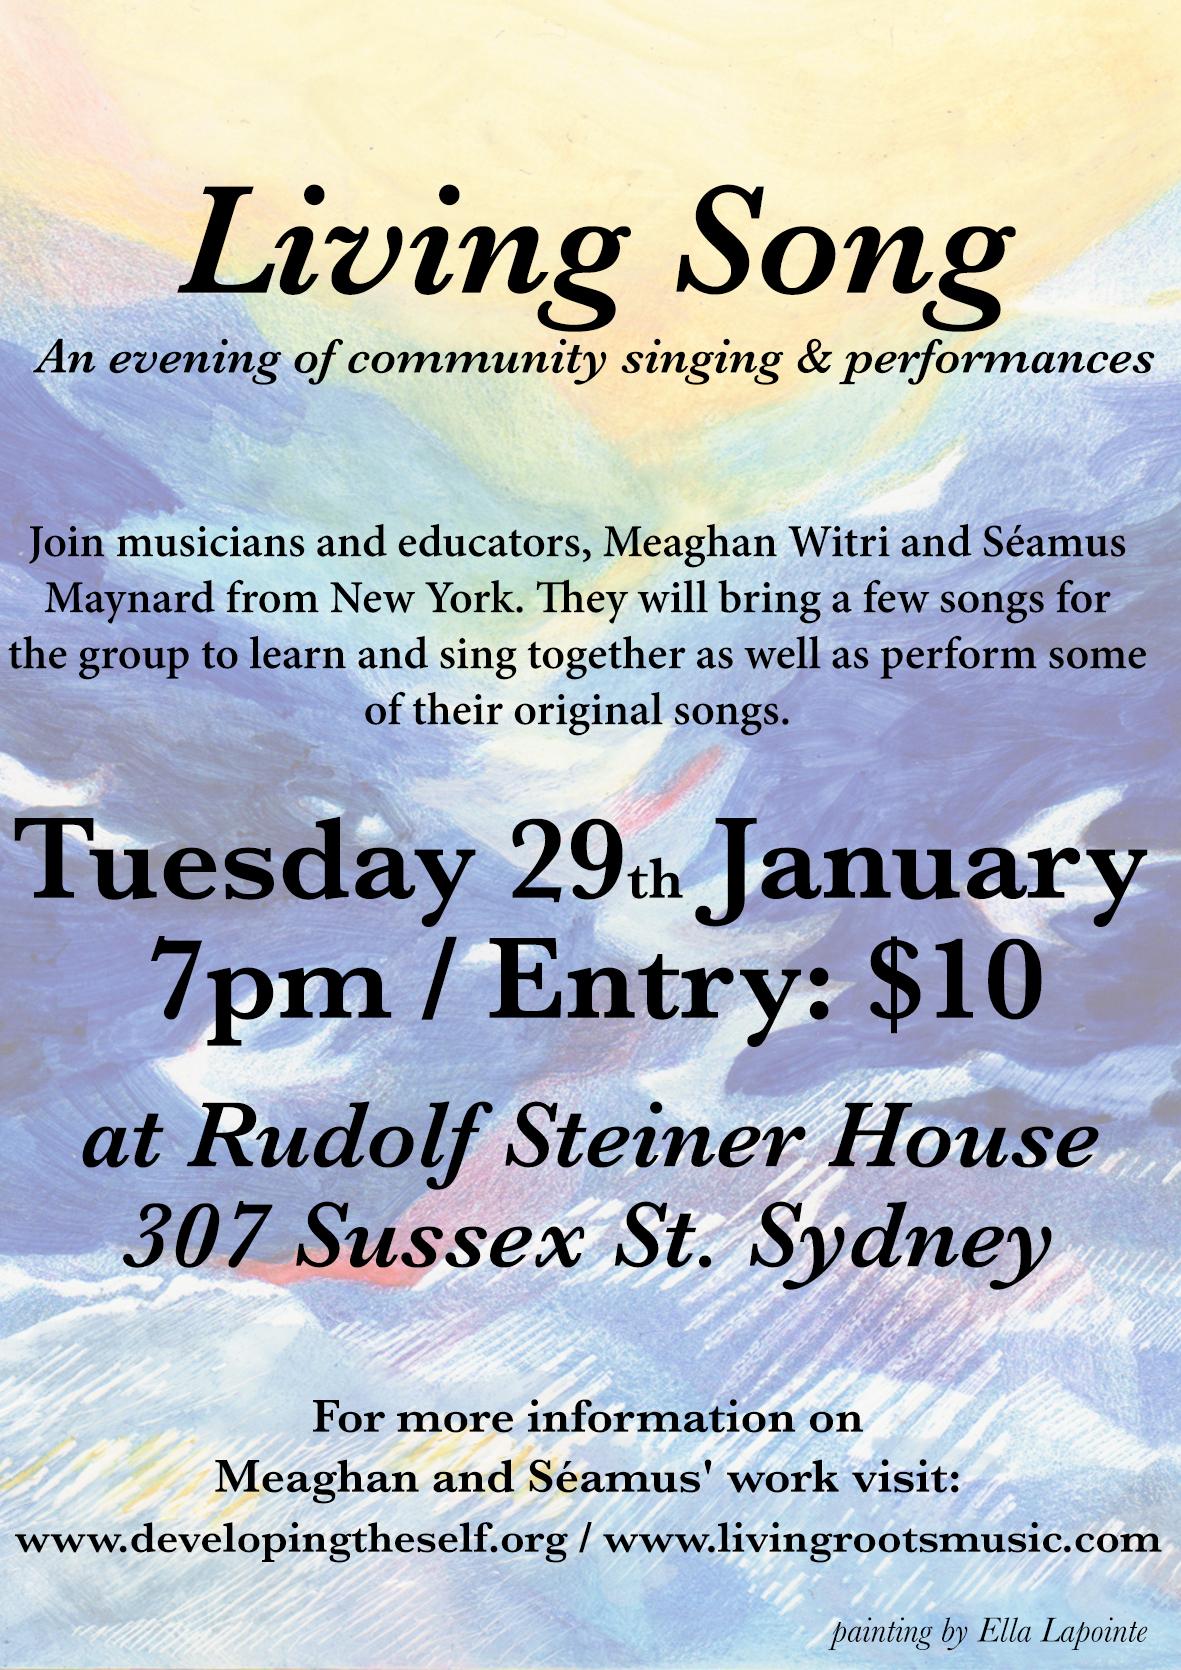 Living Song Poster Steiner House 2019.jpeg